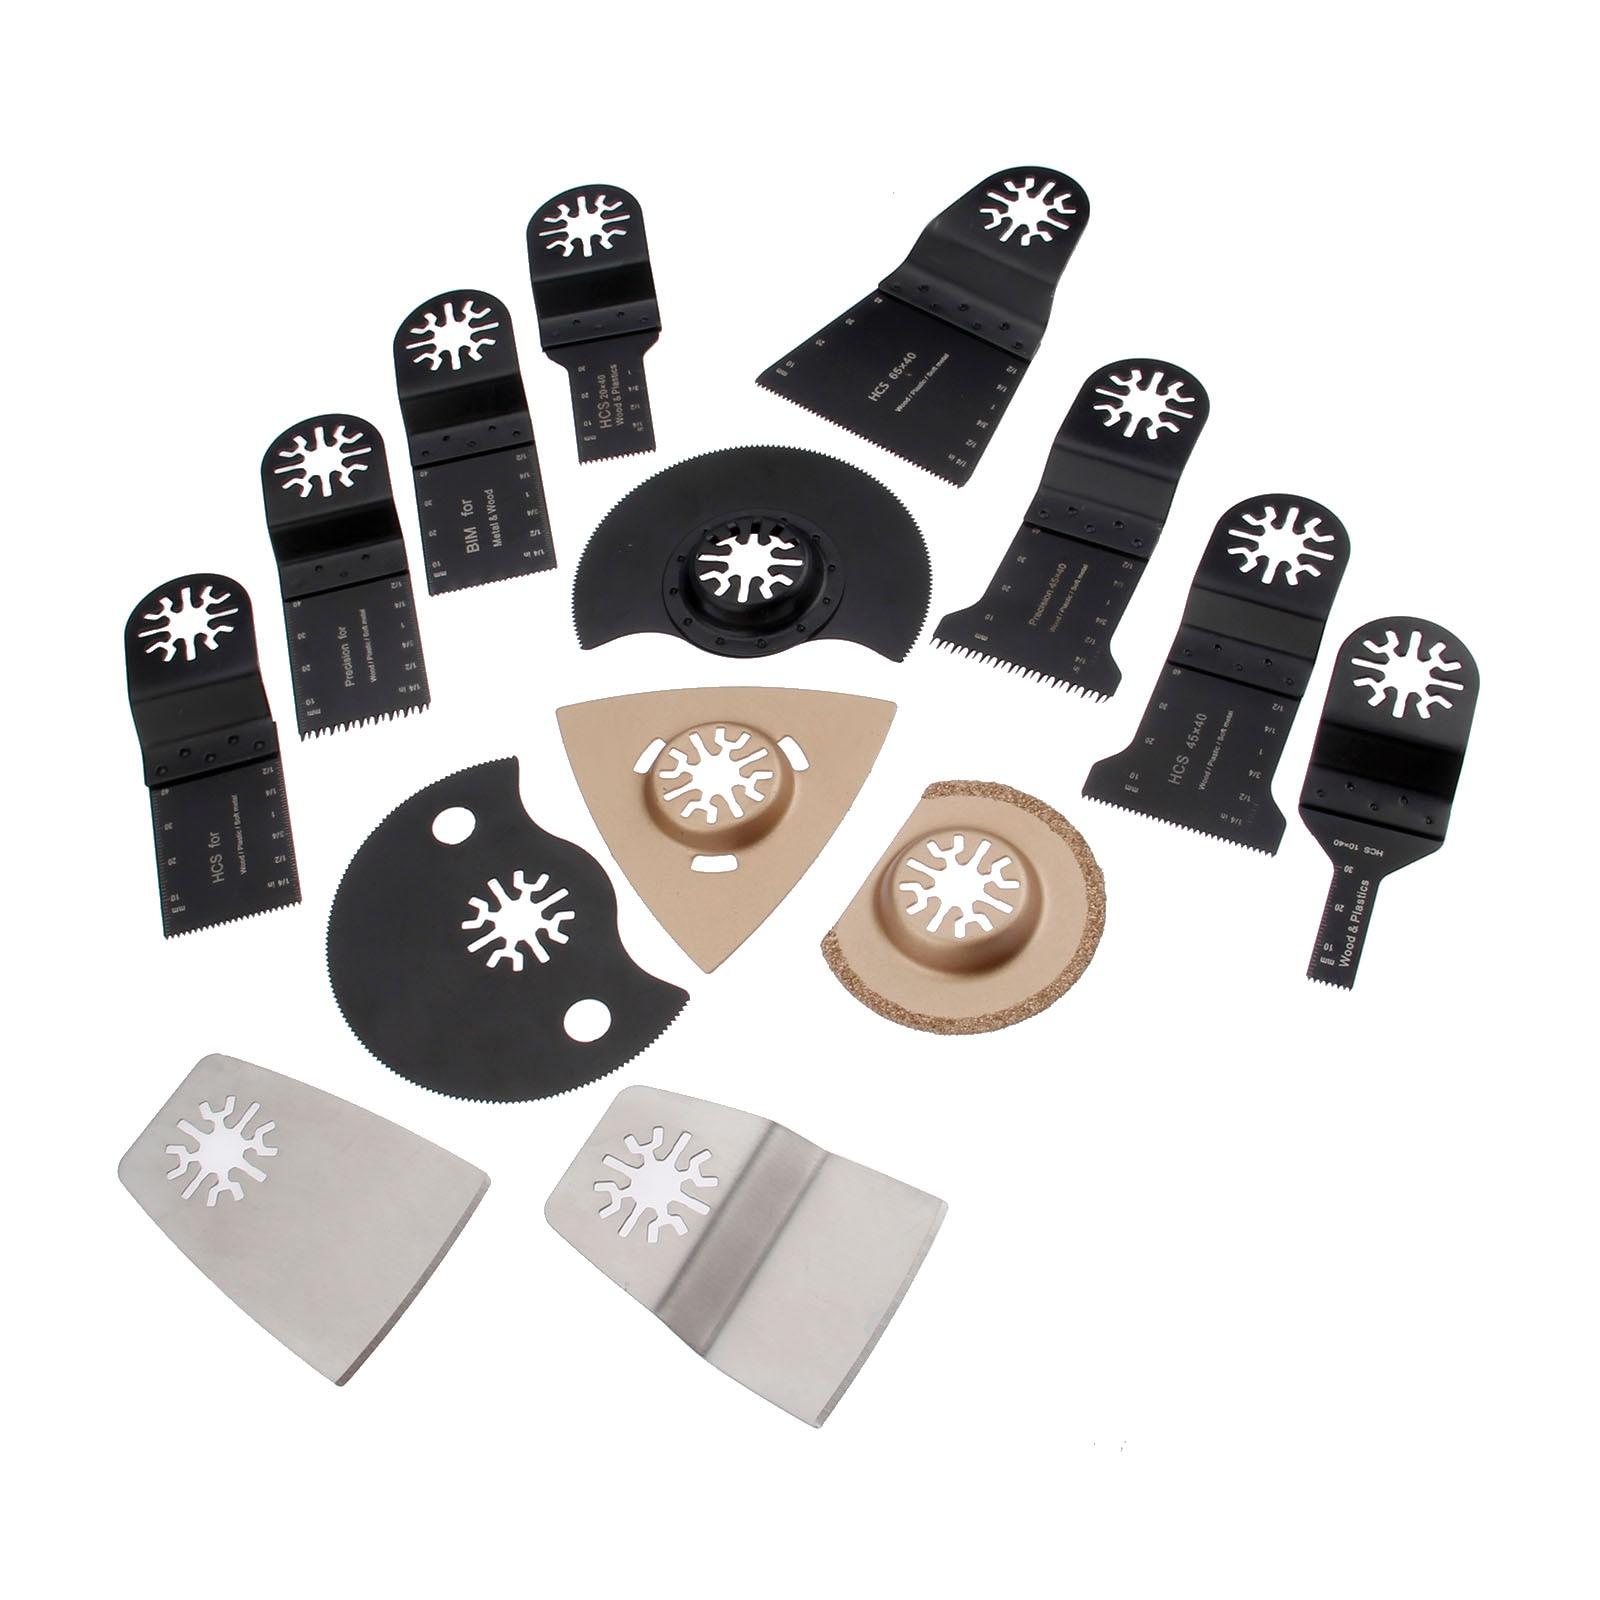 DRELD 14 Pcs Set Oscillating Multi Tool Saw Blades Accessory For Renovator Fein Dremel TCH Multimaster Power Tool Metal Cutting